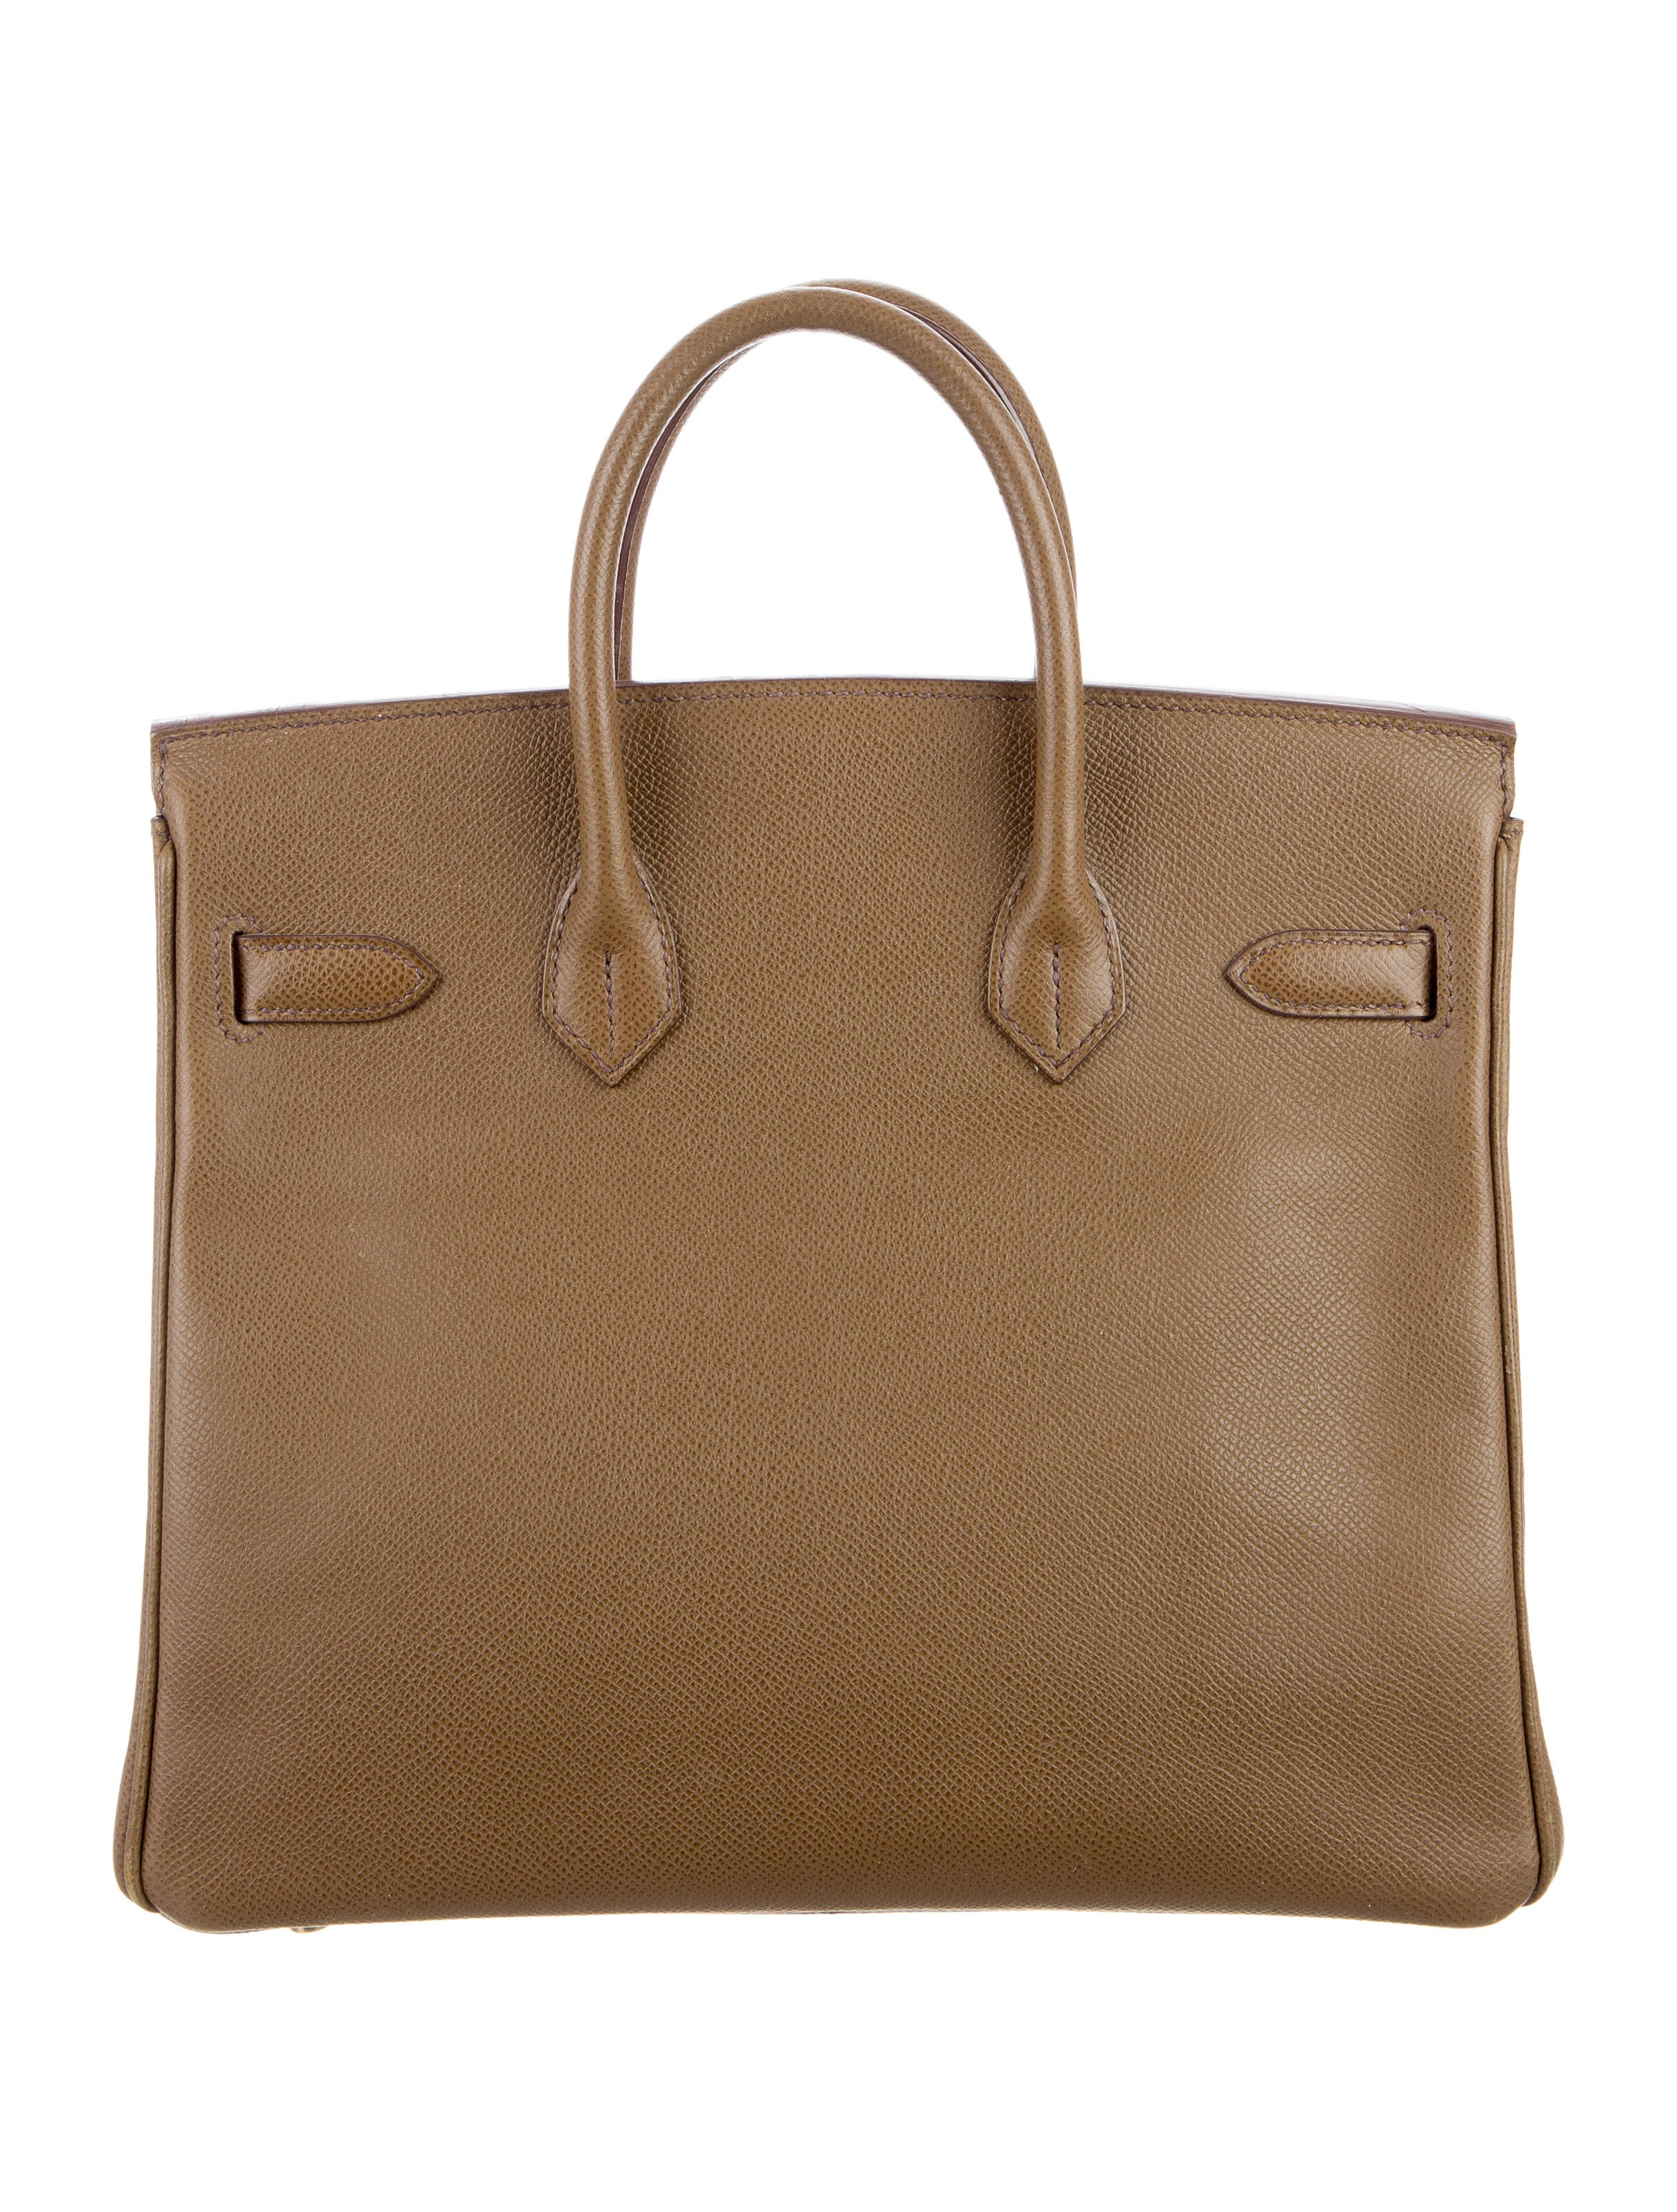 c2e92d0da6d7 ... coupon code hermès hac birkin 28 handbags her88790 the realreal b55c2  92997